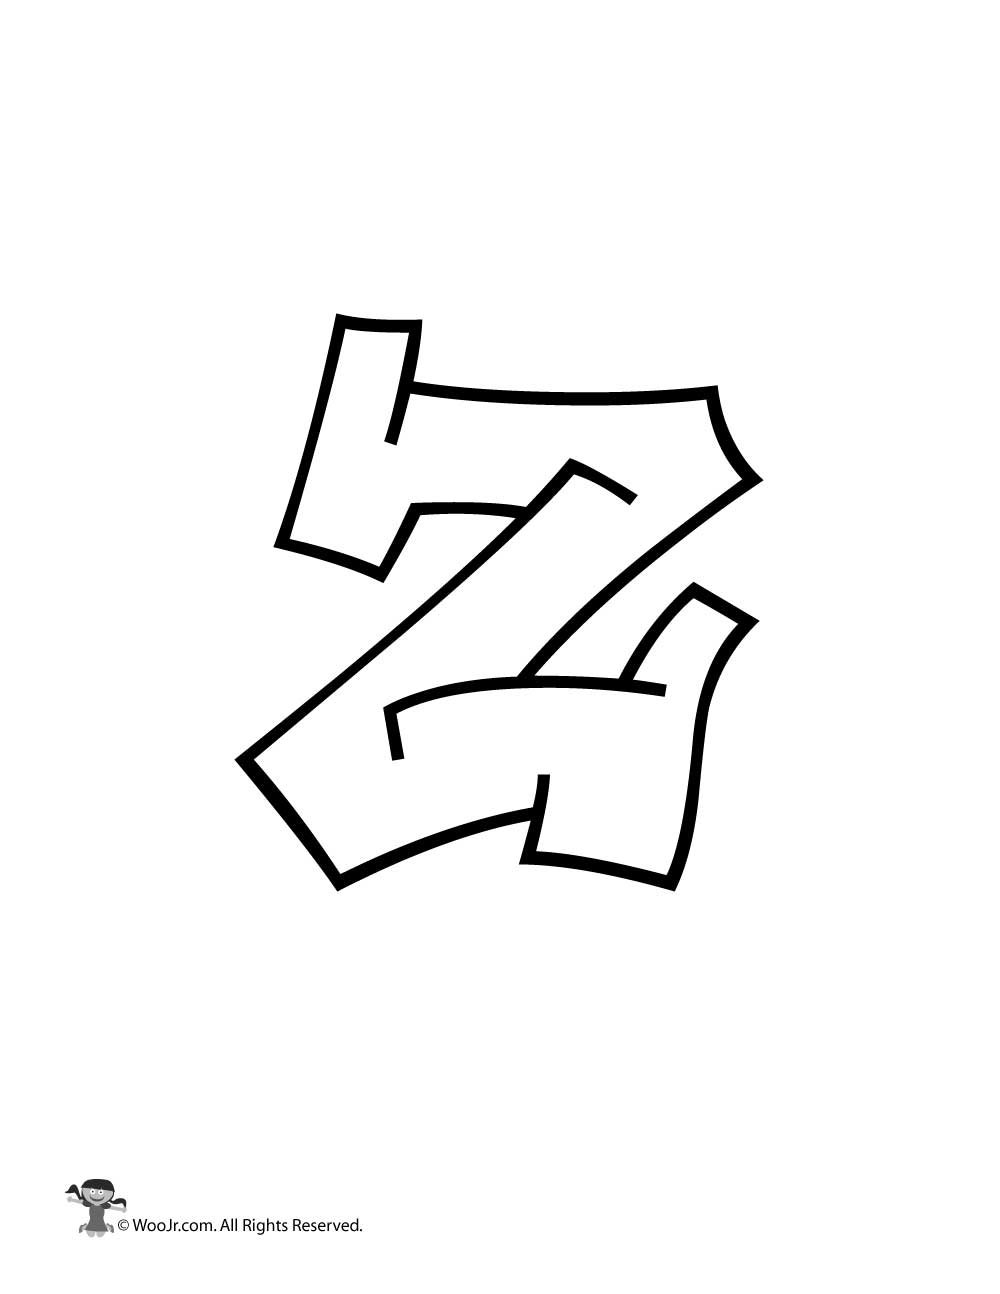 Graffiti lowercase letter z woo jr kids activities